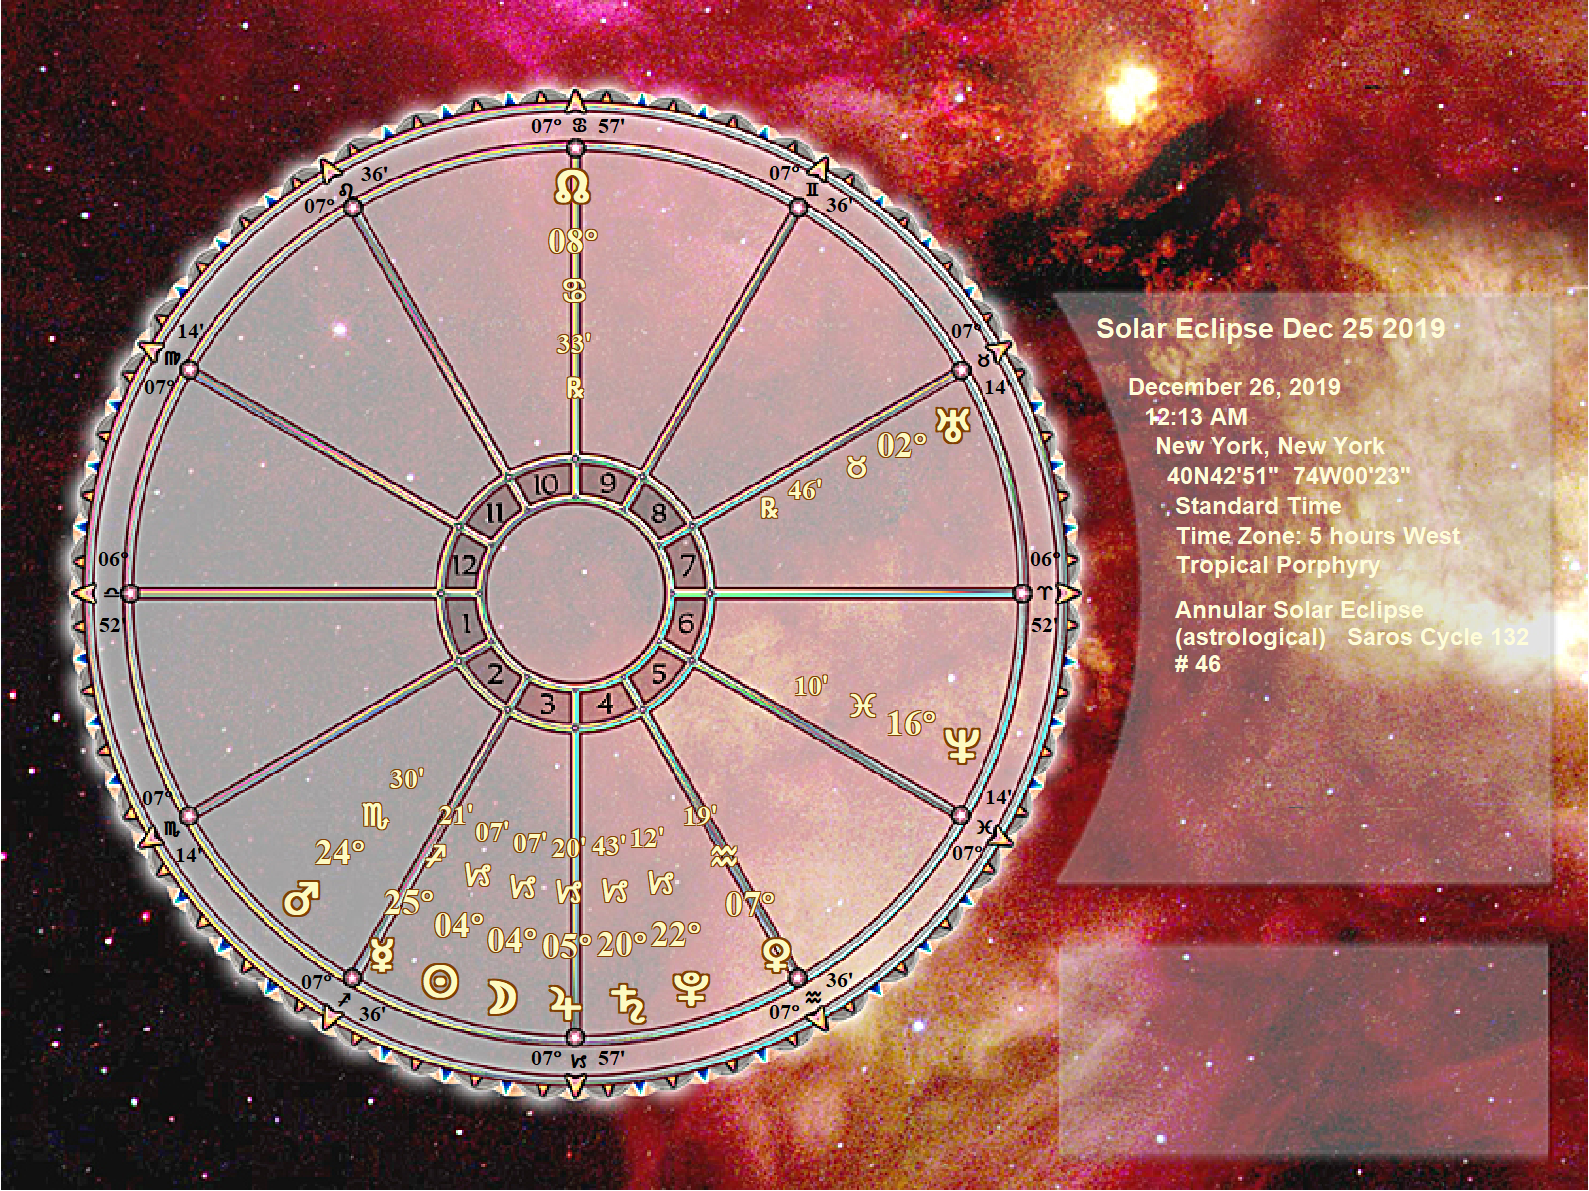 solar eclipse chart 12/26/19